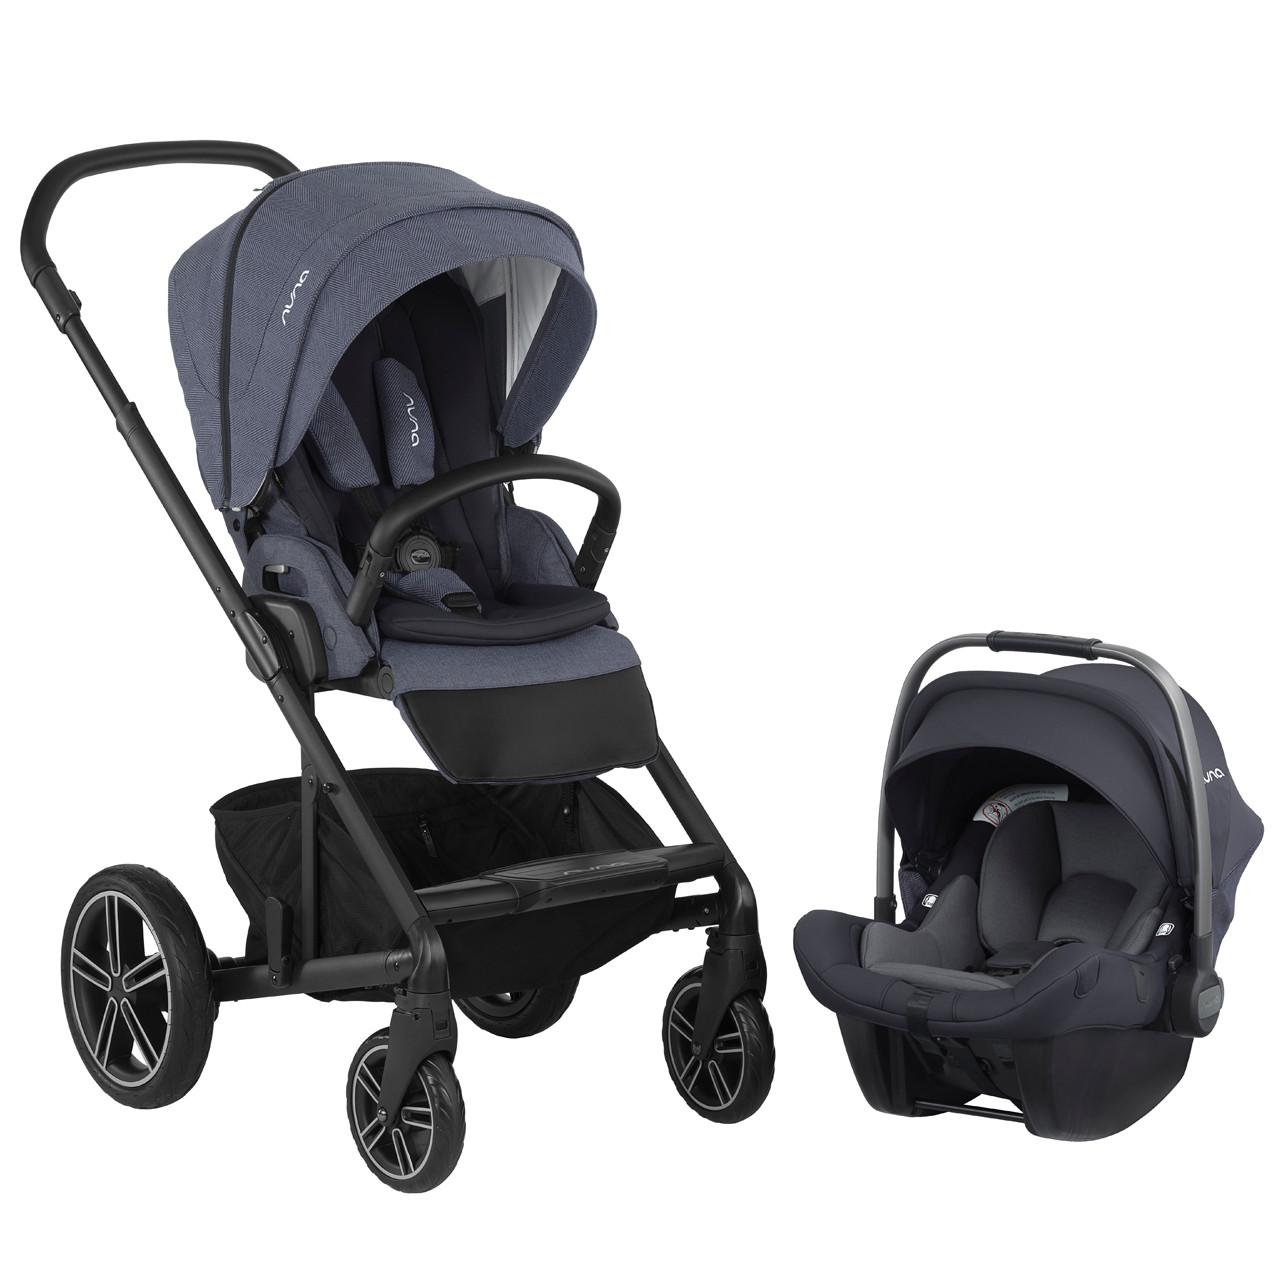 Nuna MIXX 2019 Stroller Travel System w/ PIPA Car Seat